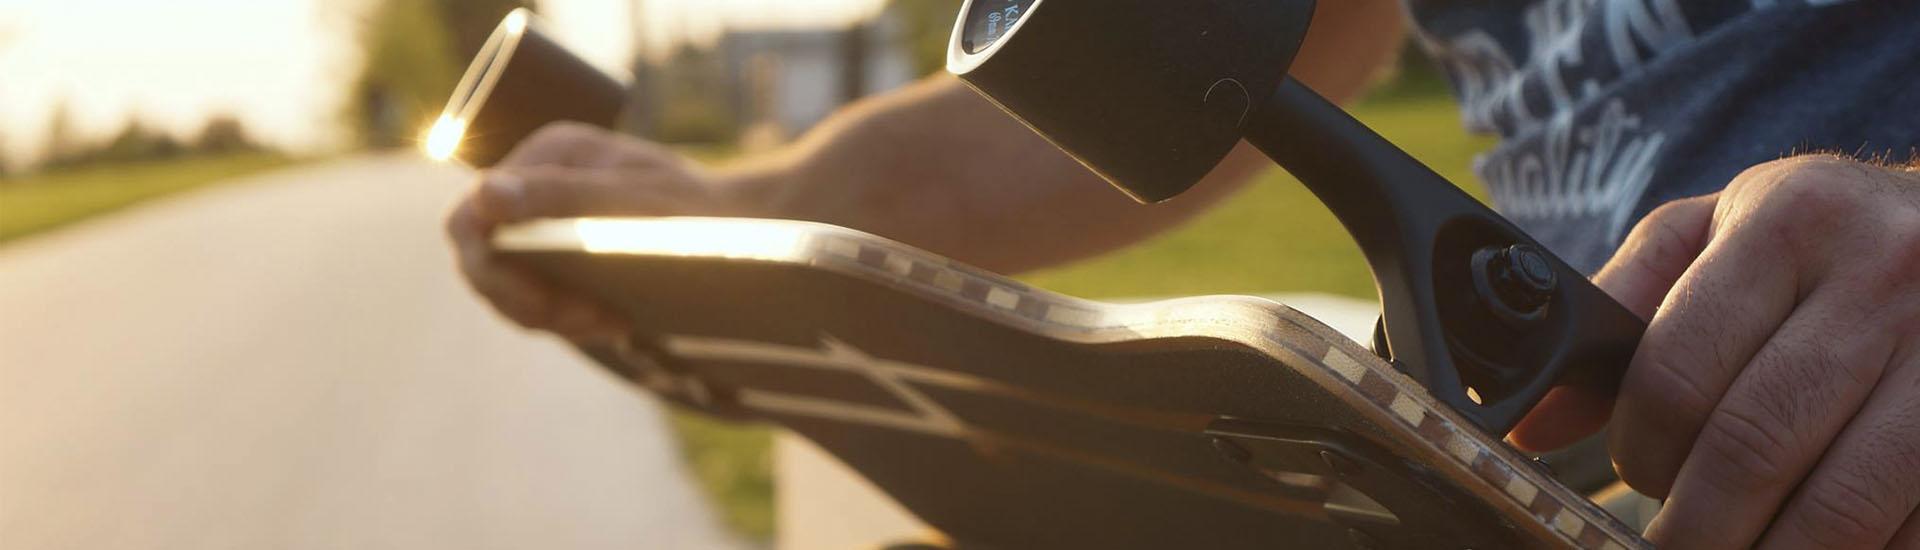 Jucker Hawaii – Longboard New Hoku vorgestellt